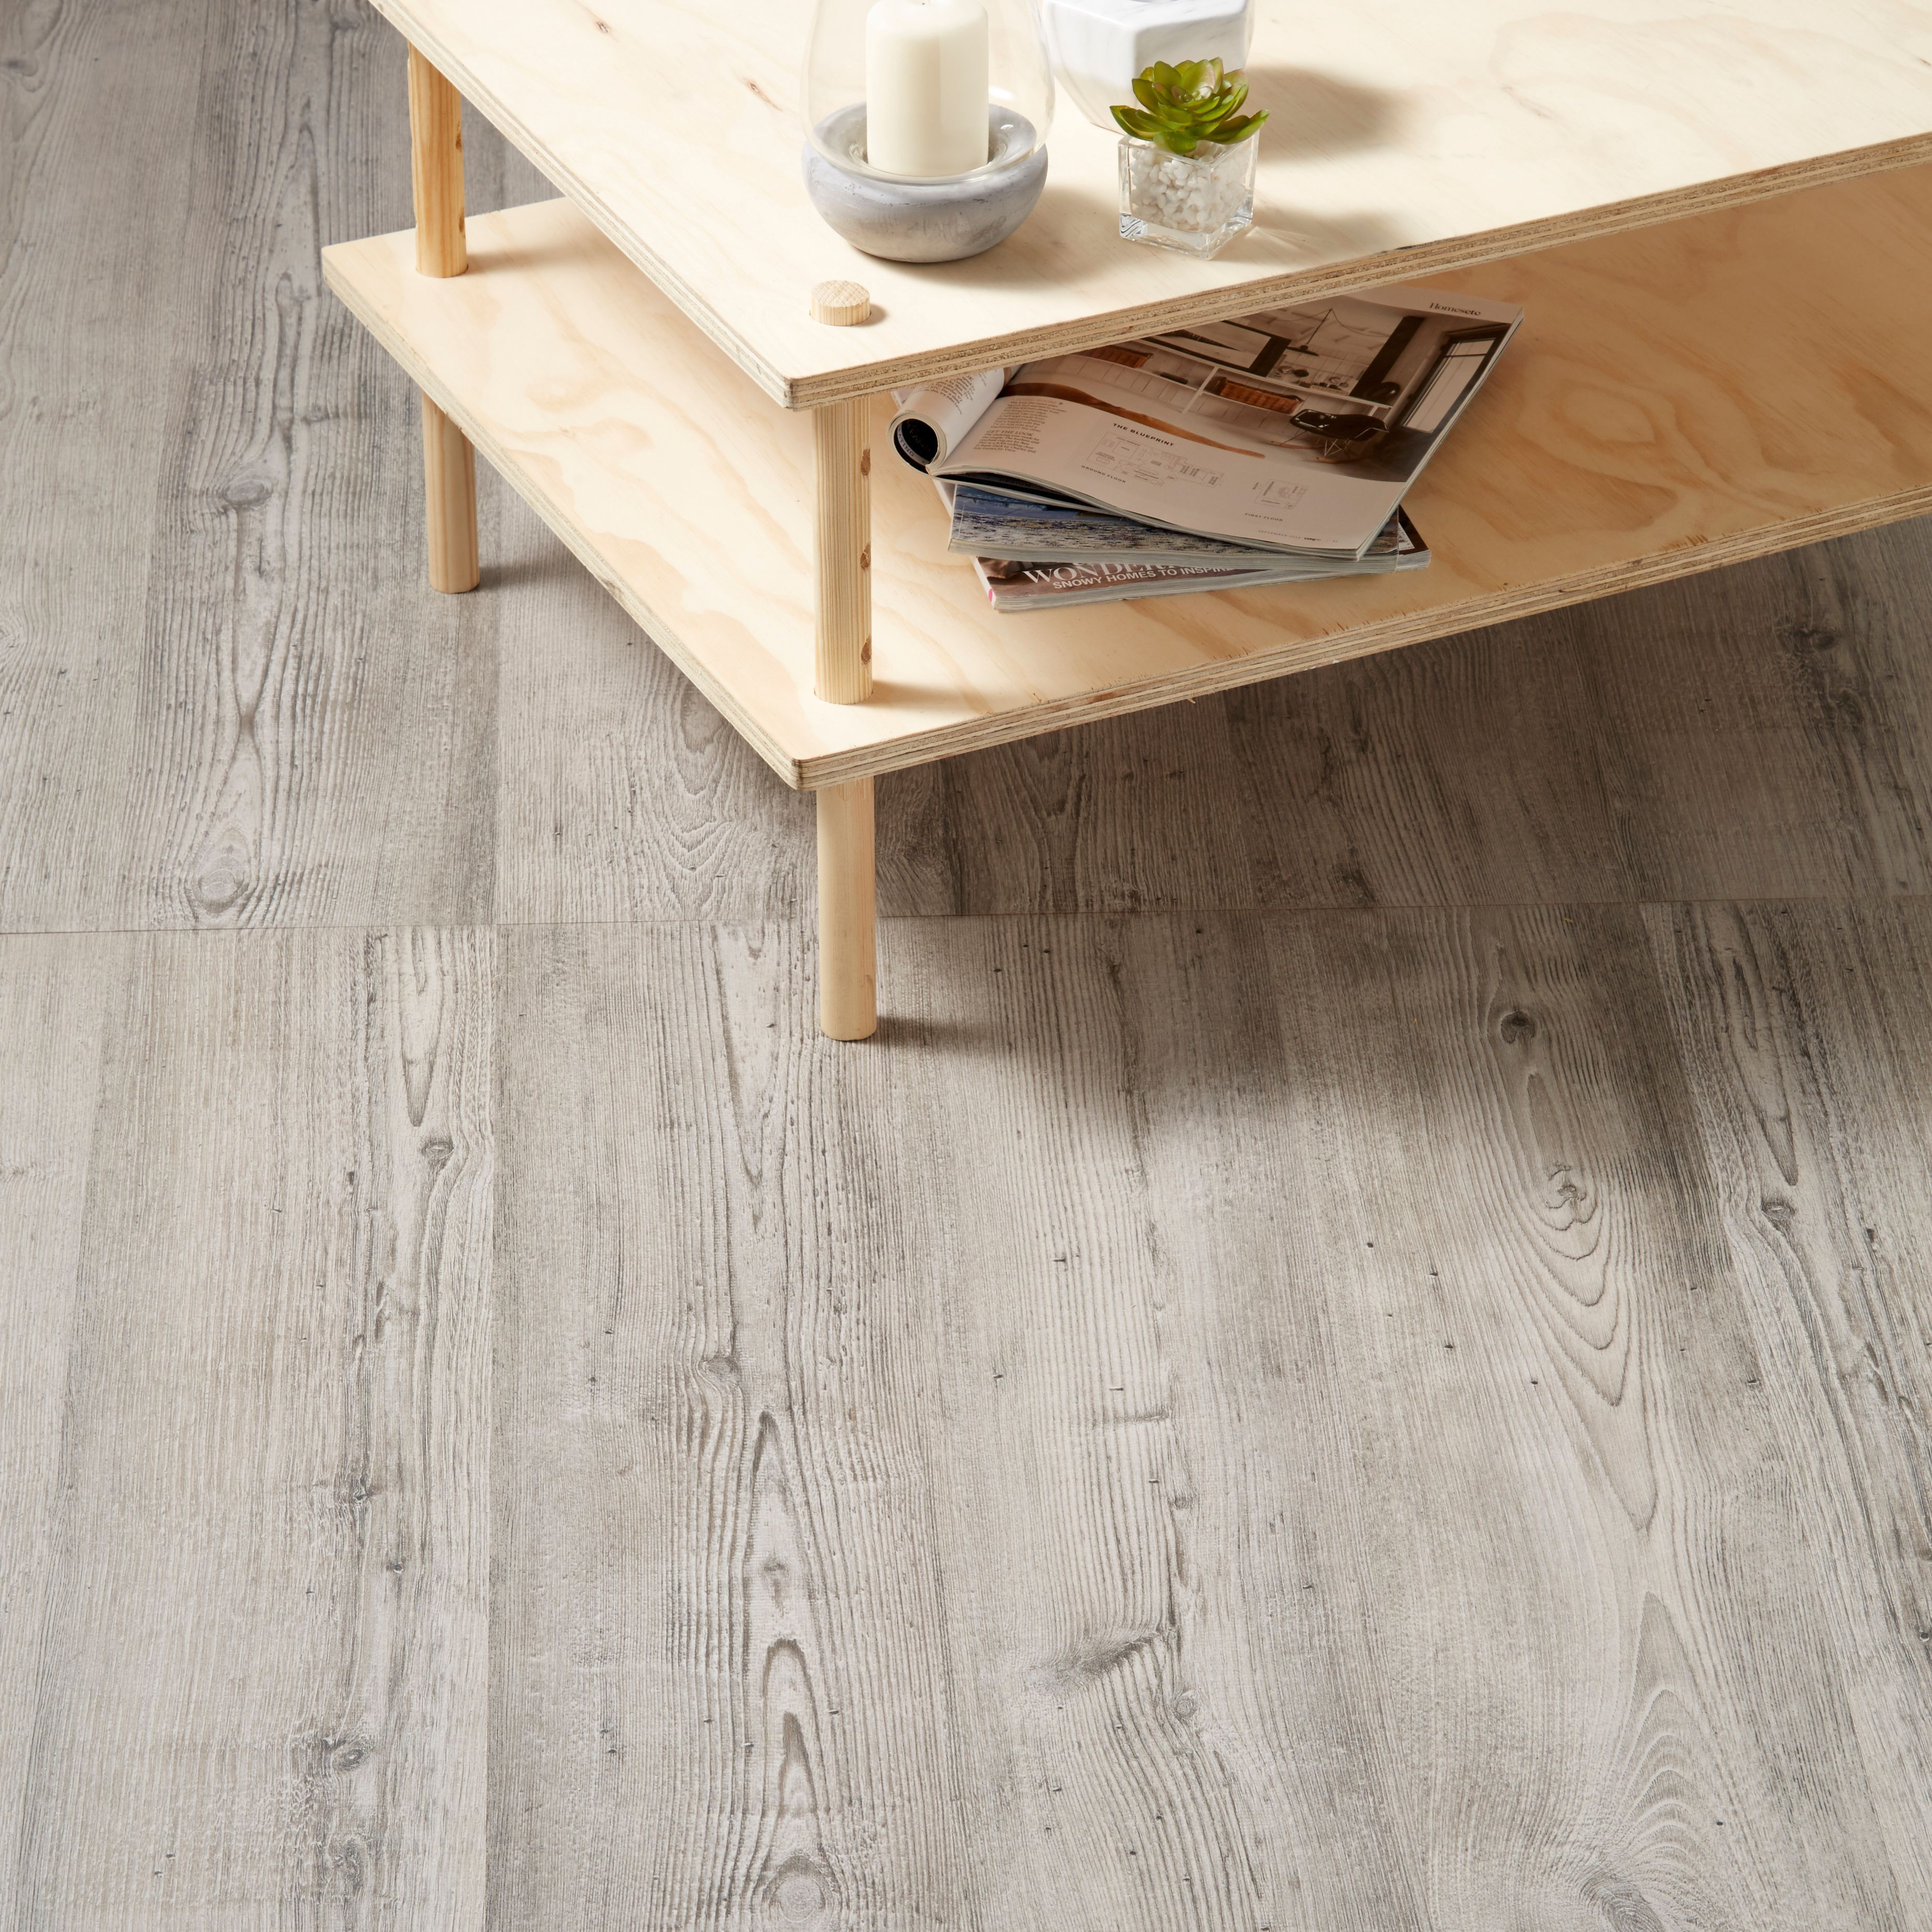 B Q Wood Floor: Bailieston Grey Oak Effect Laminate Flooring Sample 1.996